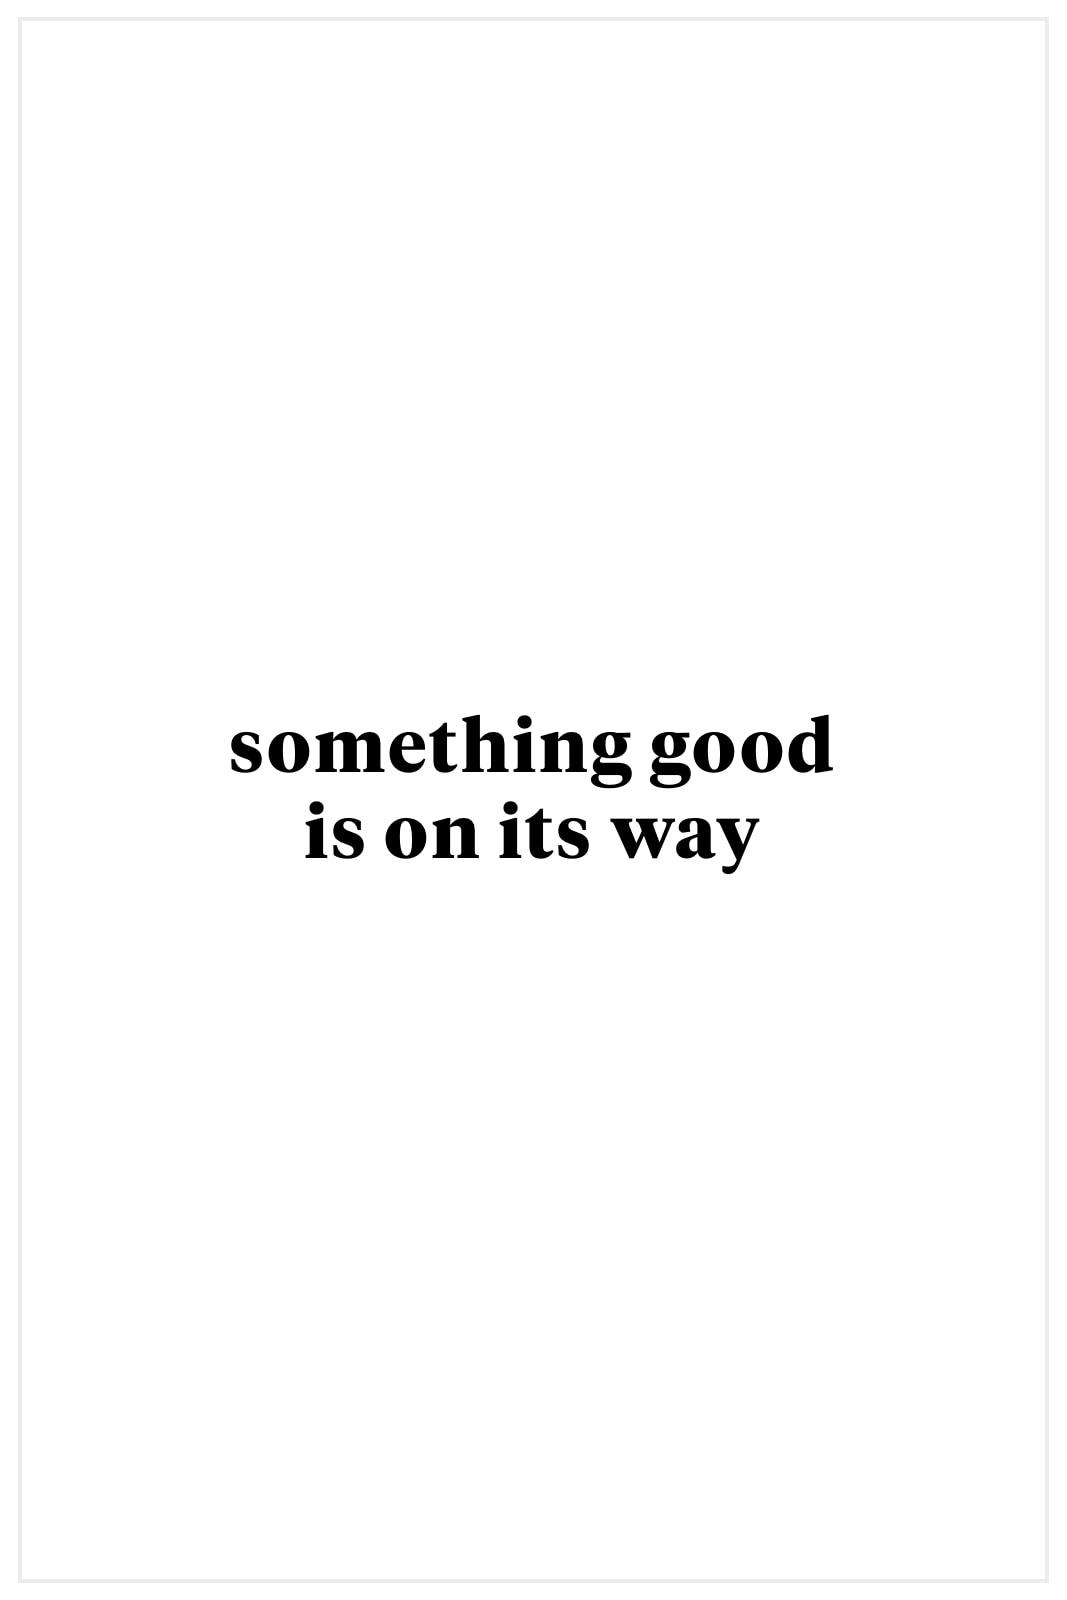 Z supply Seamed Pullover Sweatshirt